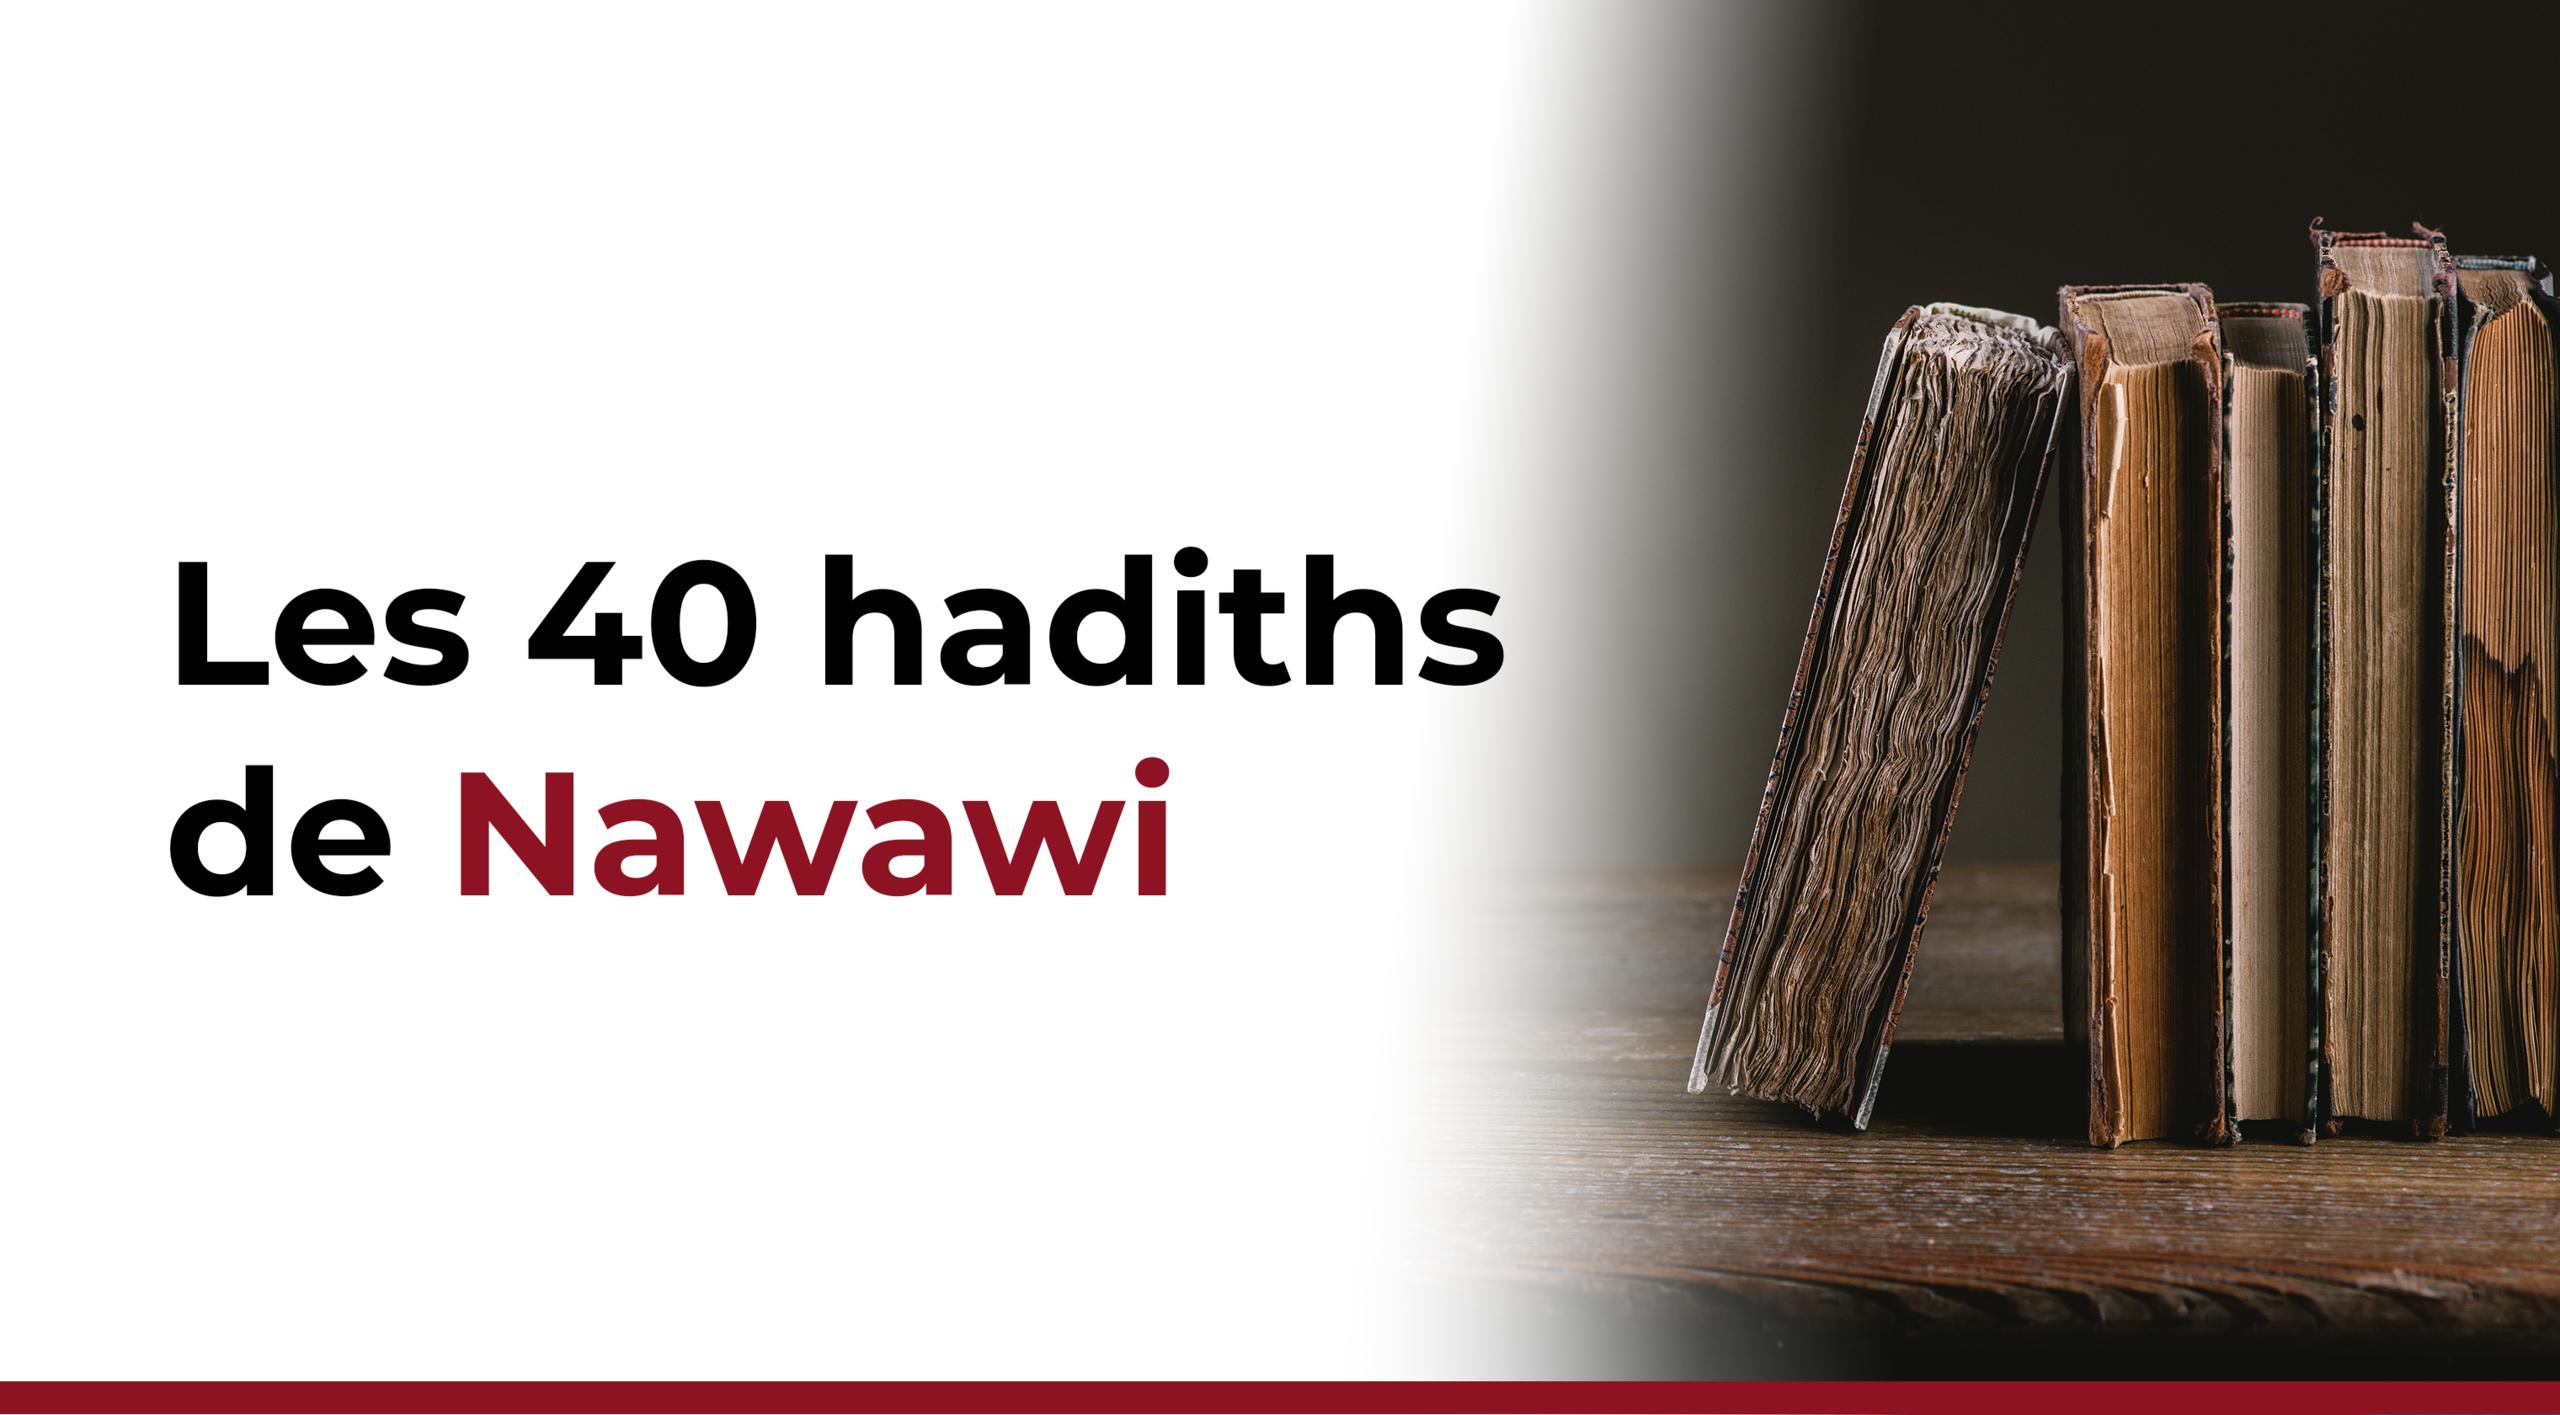 Les 40 hadiths Nawawi